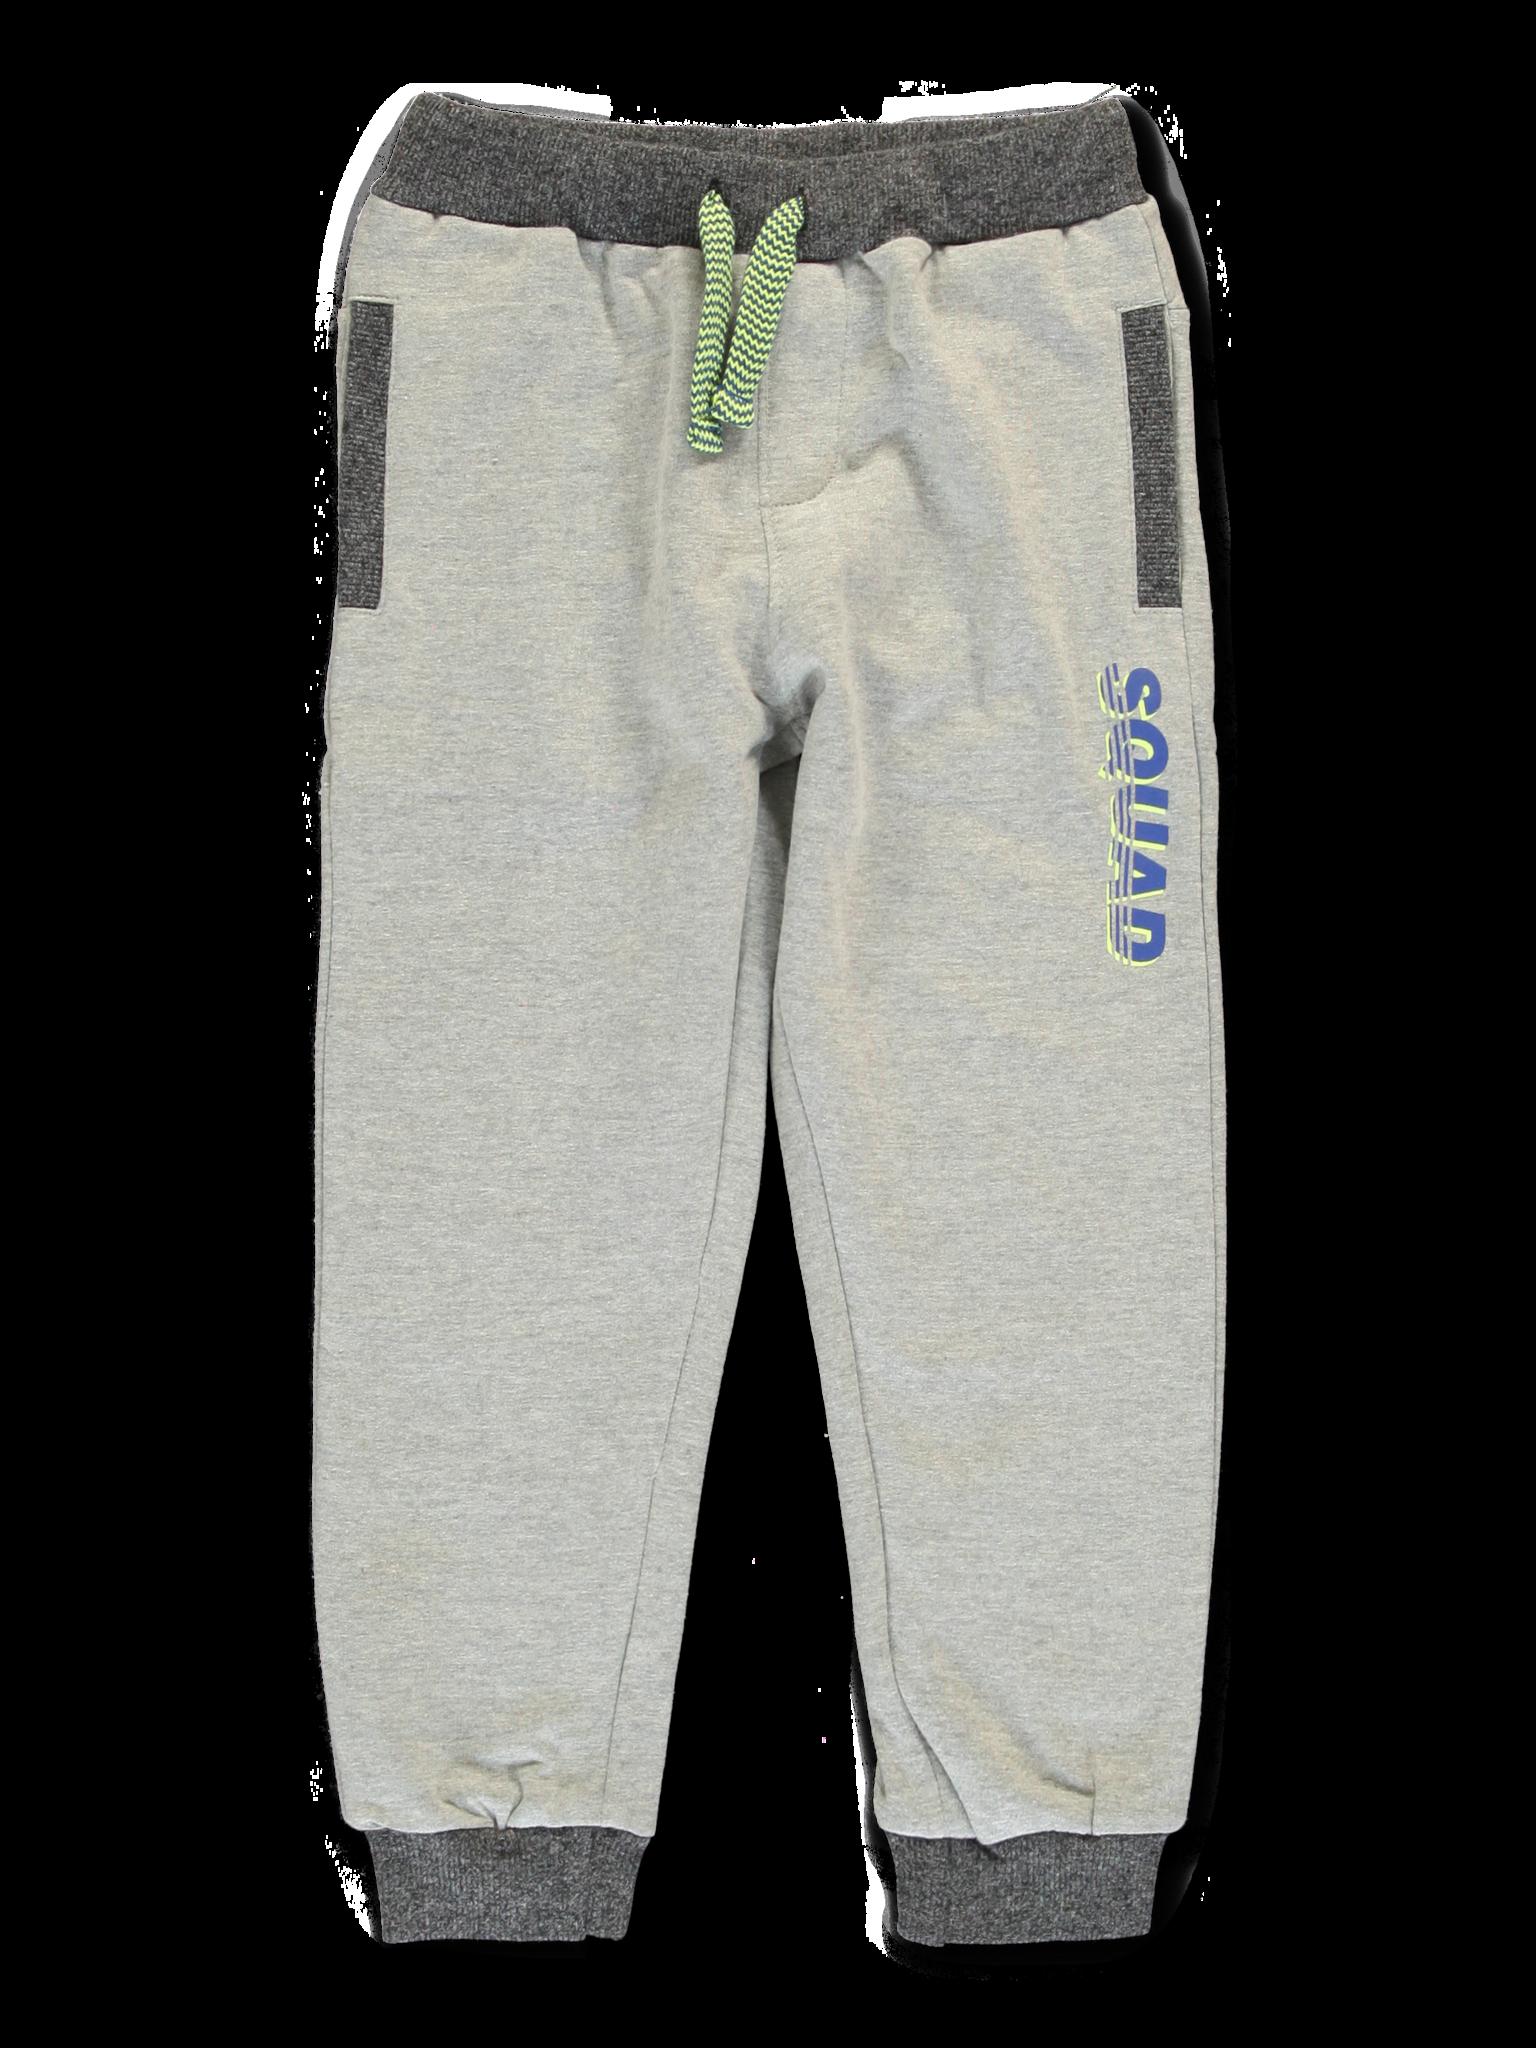 All Brands   Winterproducts Small Boys   Jogging Pant   12 pcs/box